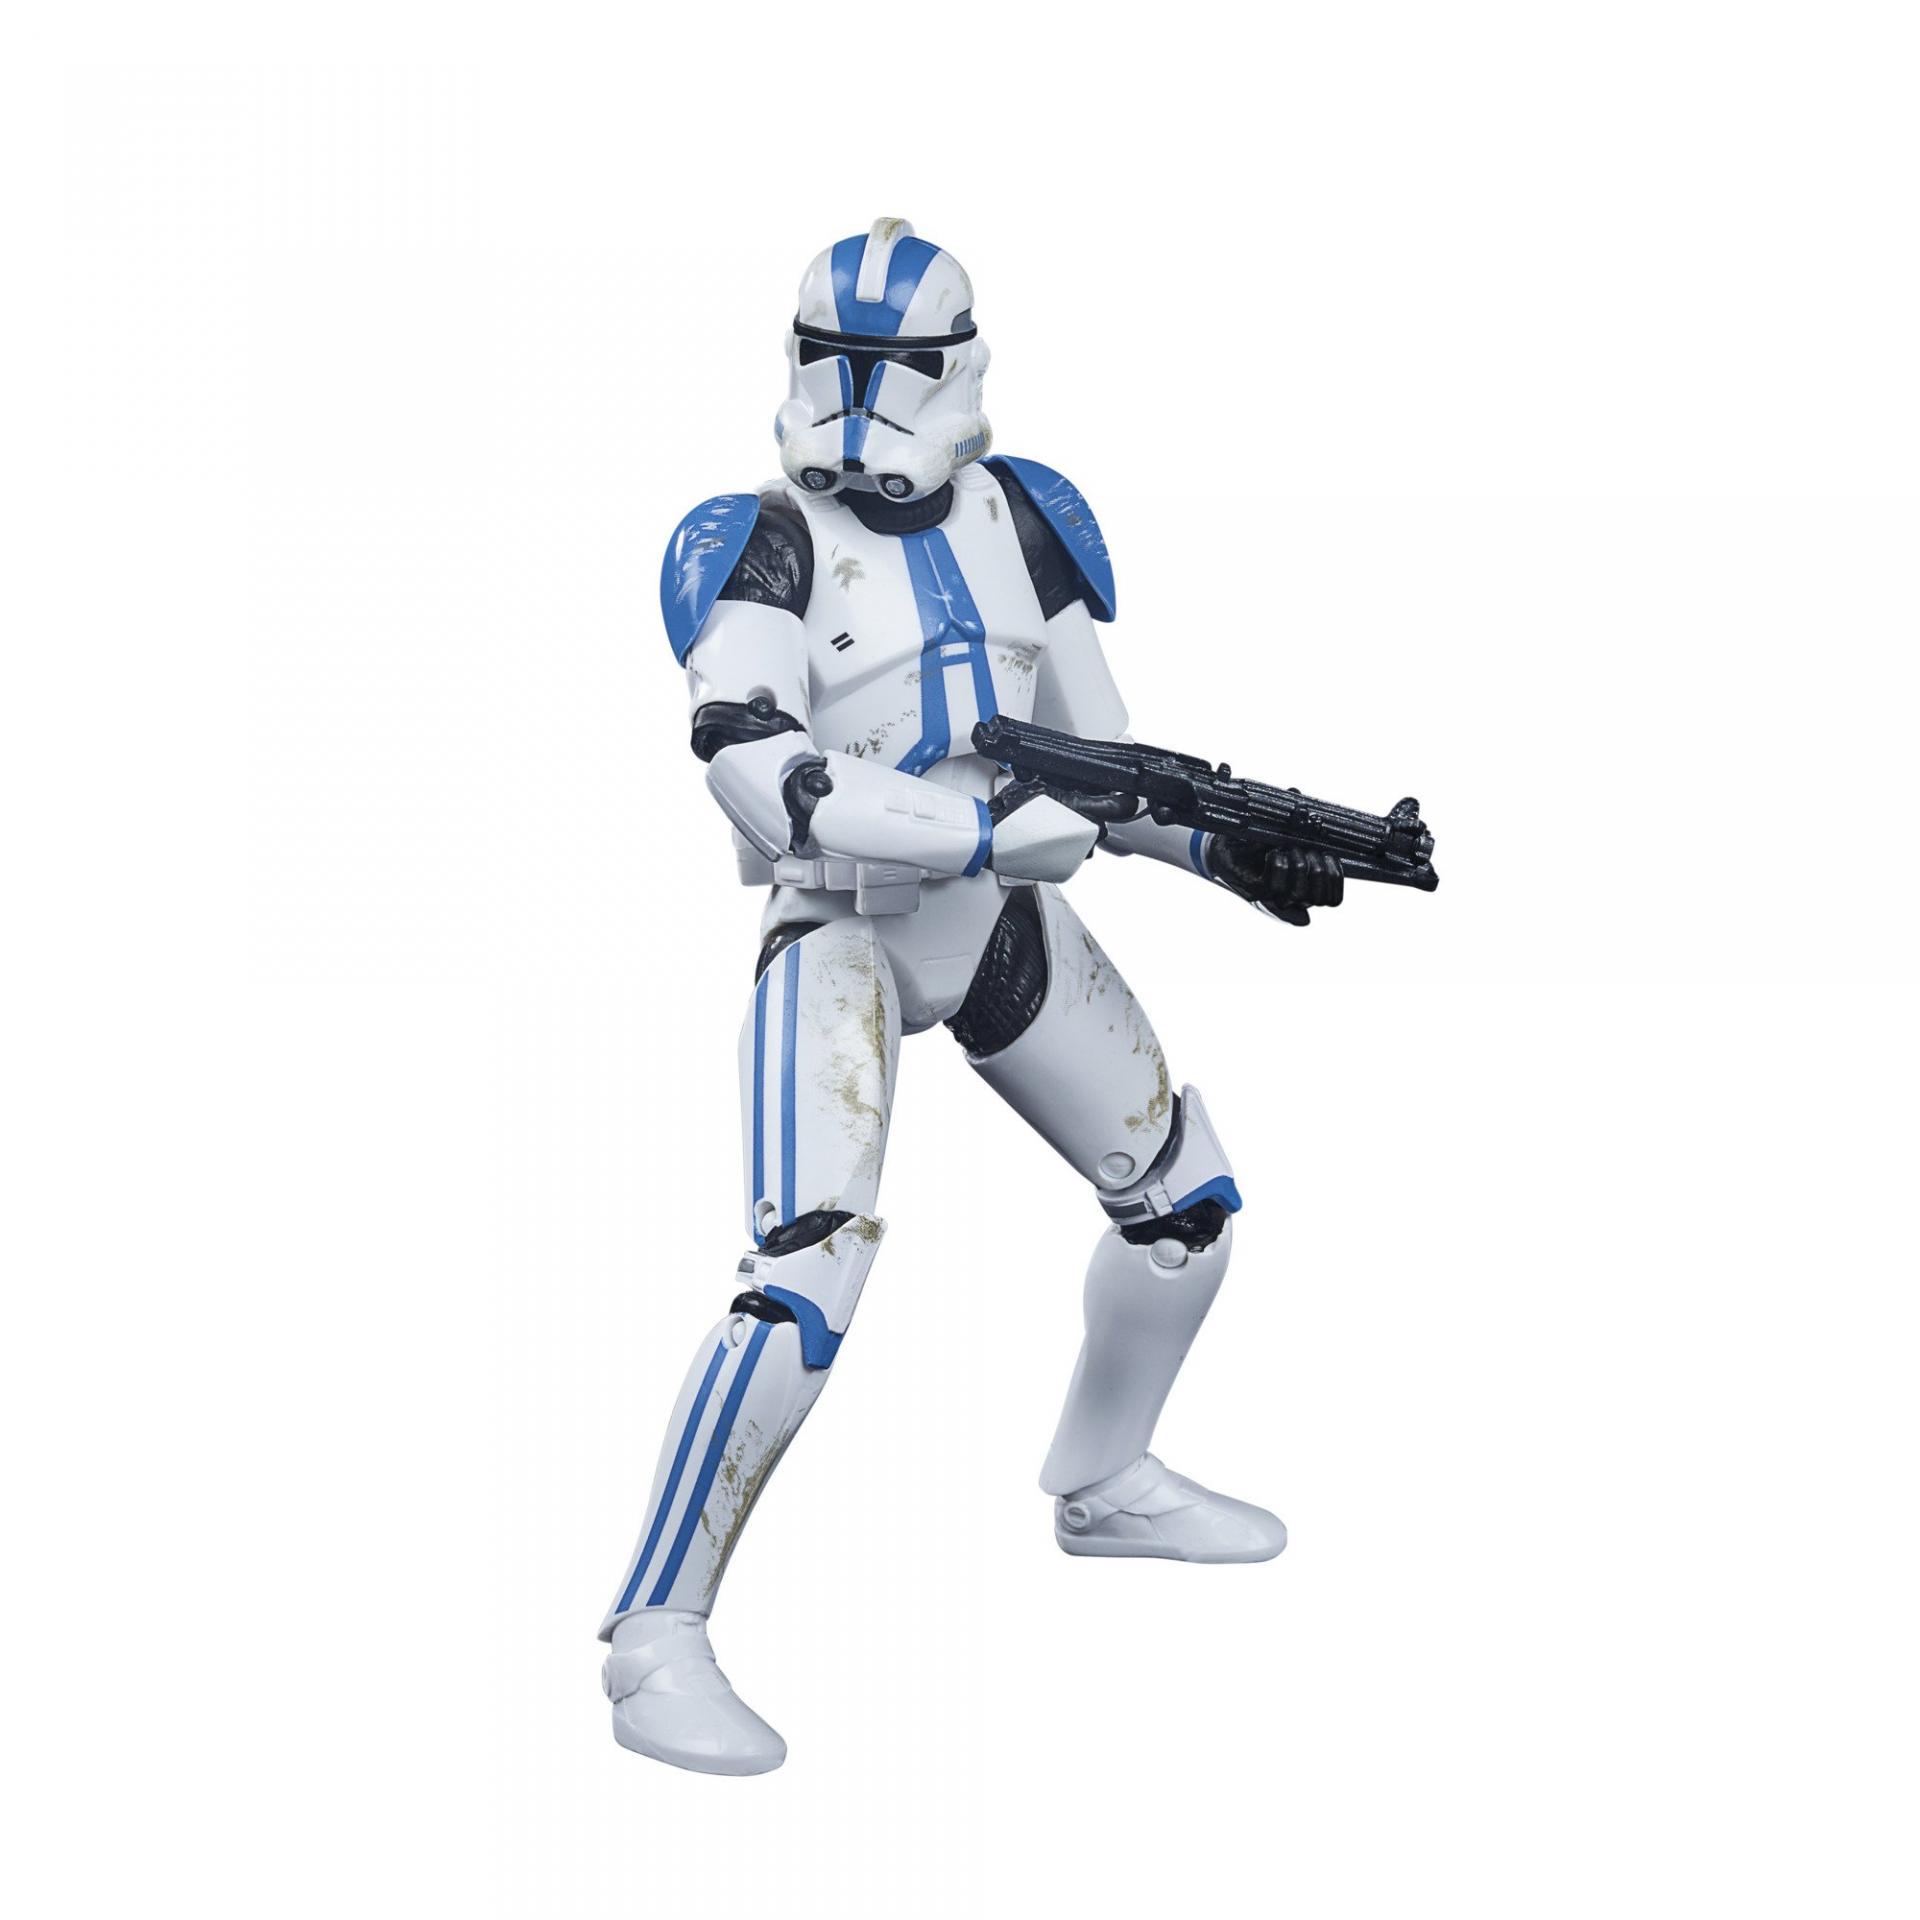 Star wars the black series archive 501st legion clone trooper 15cm7